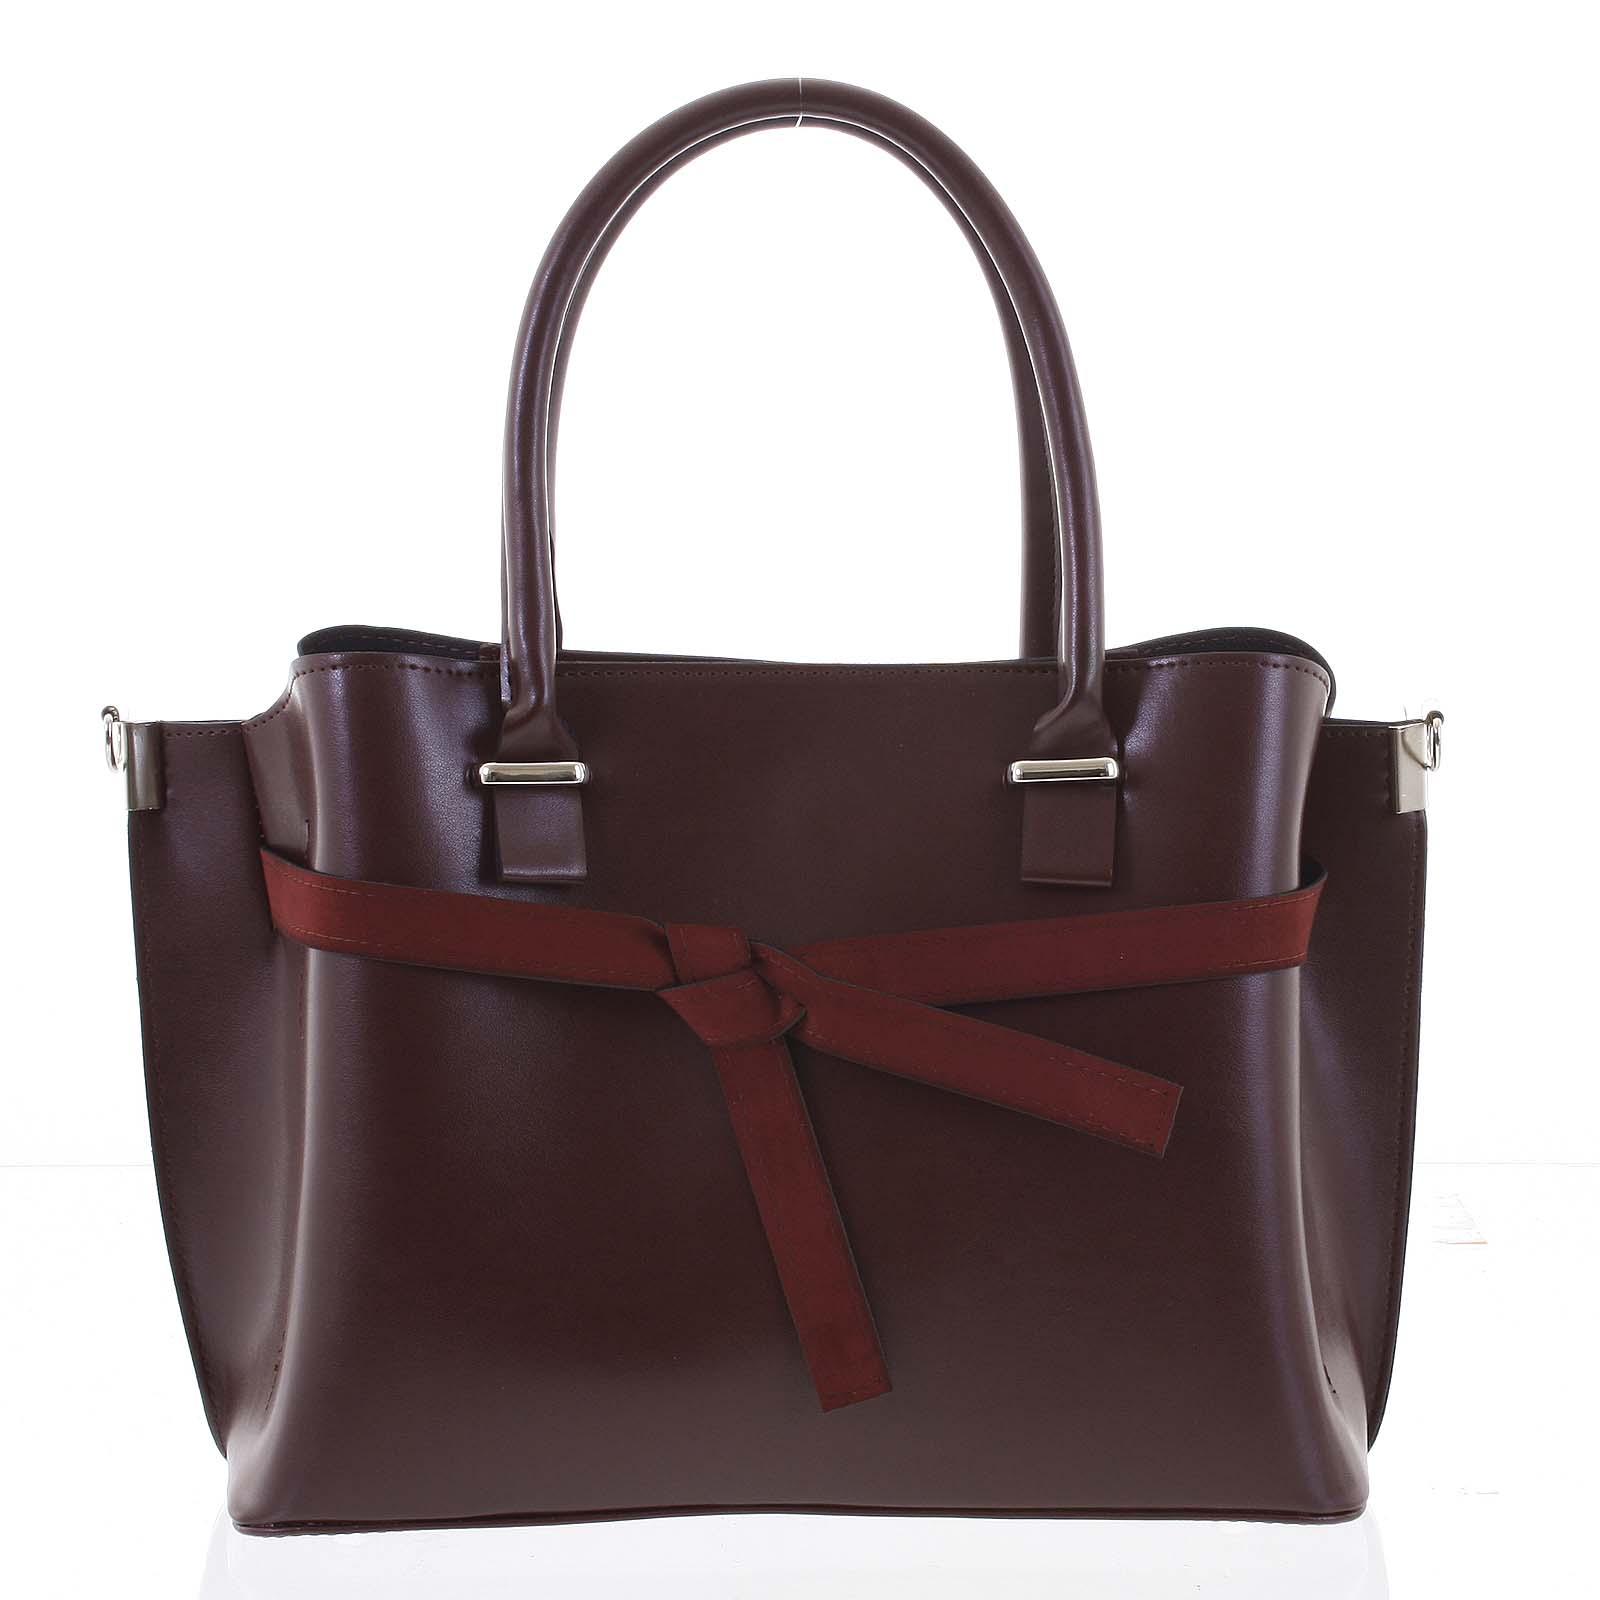 Trendy dámská kabelka do ruky vínová - Delami Giovanna vínová